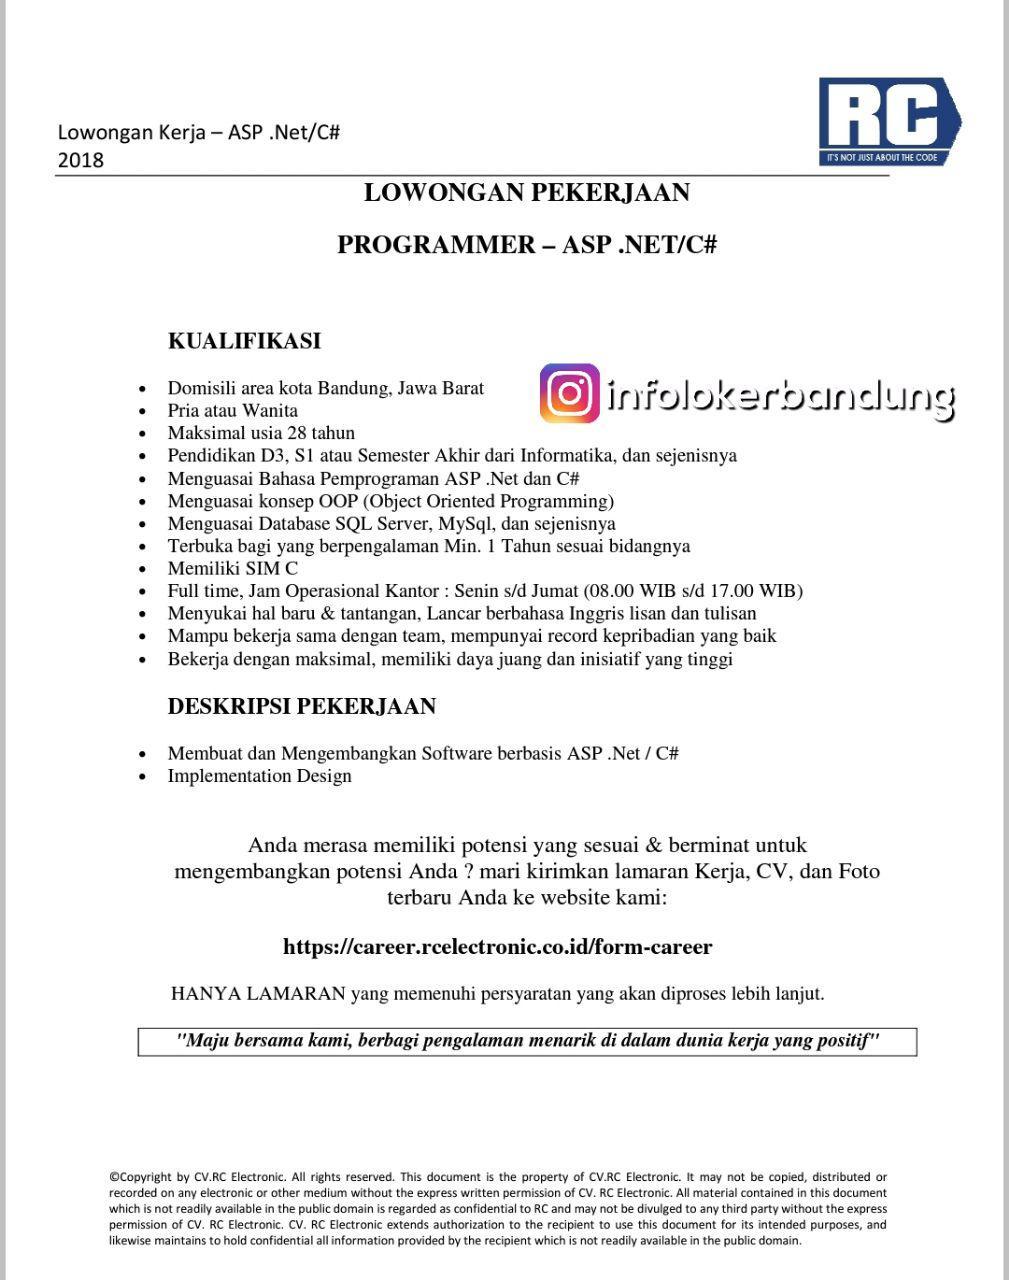 Lowongan Kerja  Programmer ASP .NET/C# CV. RC Electronic Bandung April 2018